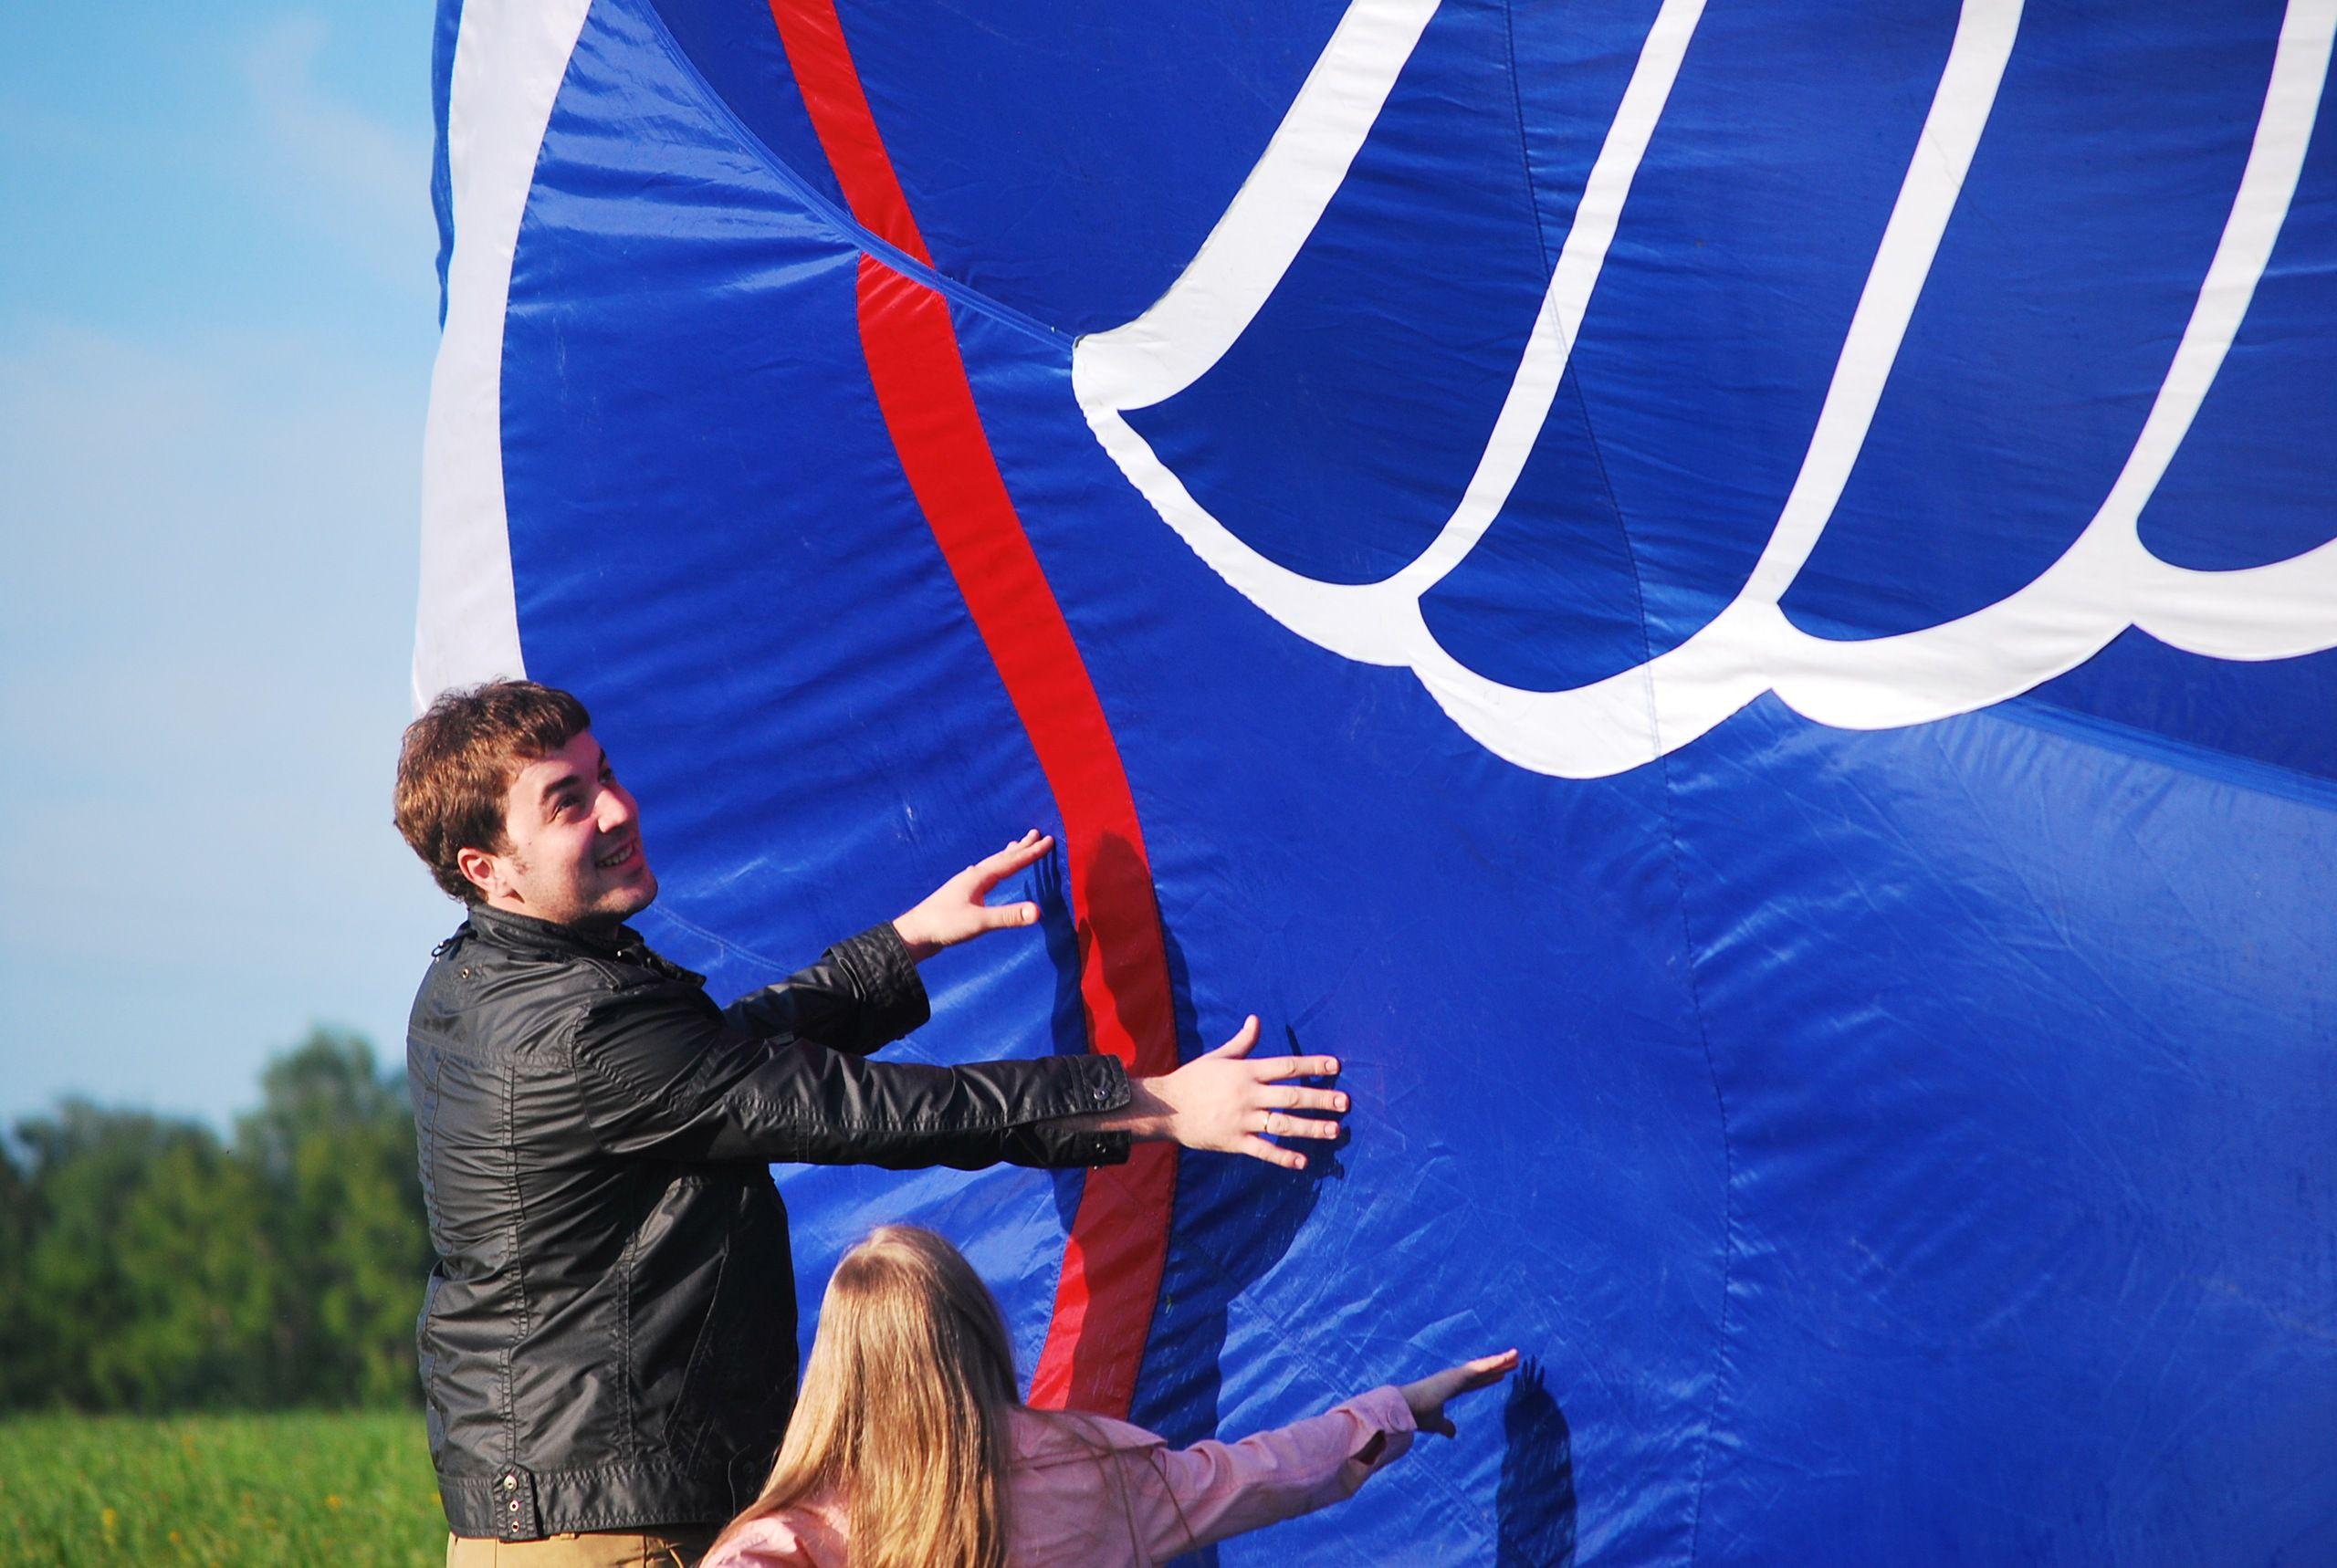 Мастер-класс «Я пилот воздушного шара» фото 3